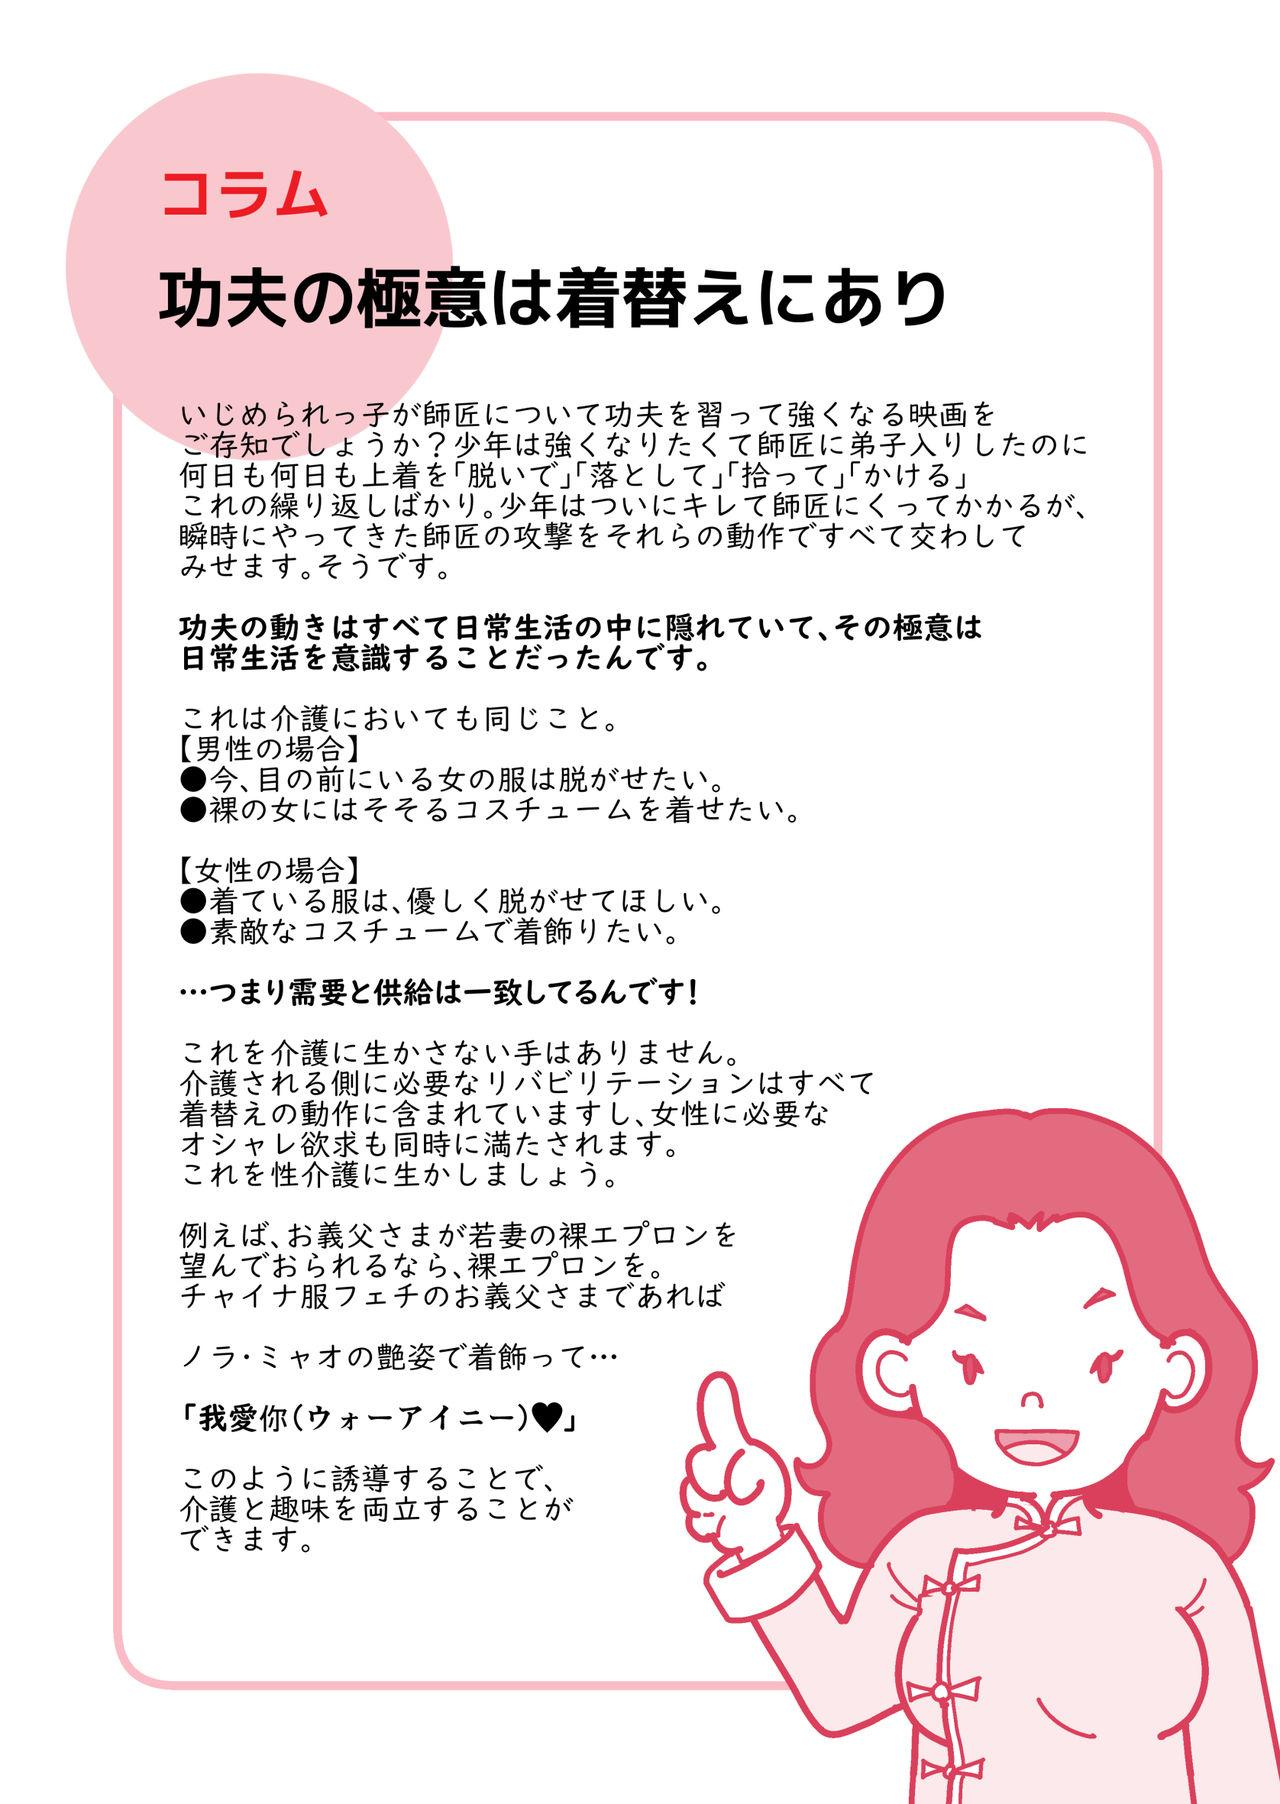 Isogasii Okaasan No Tamuno Sasa Rouzin Seikaigo | Guide for Elderly Sex Health Care to Busy Mom 27